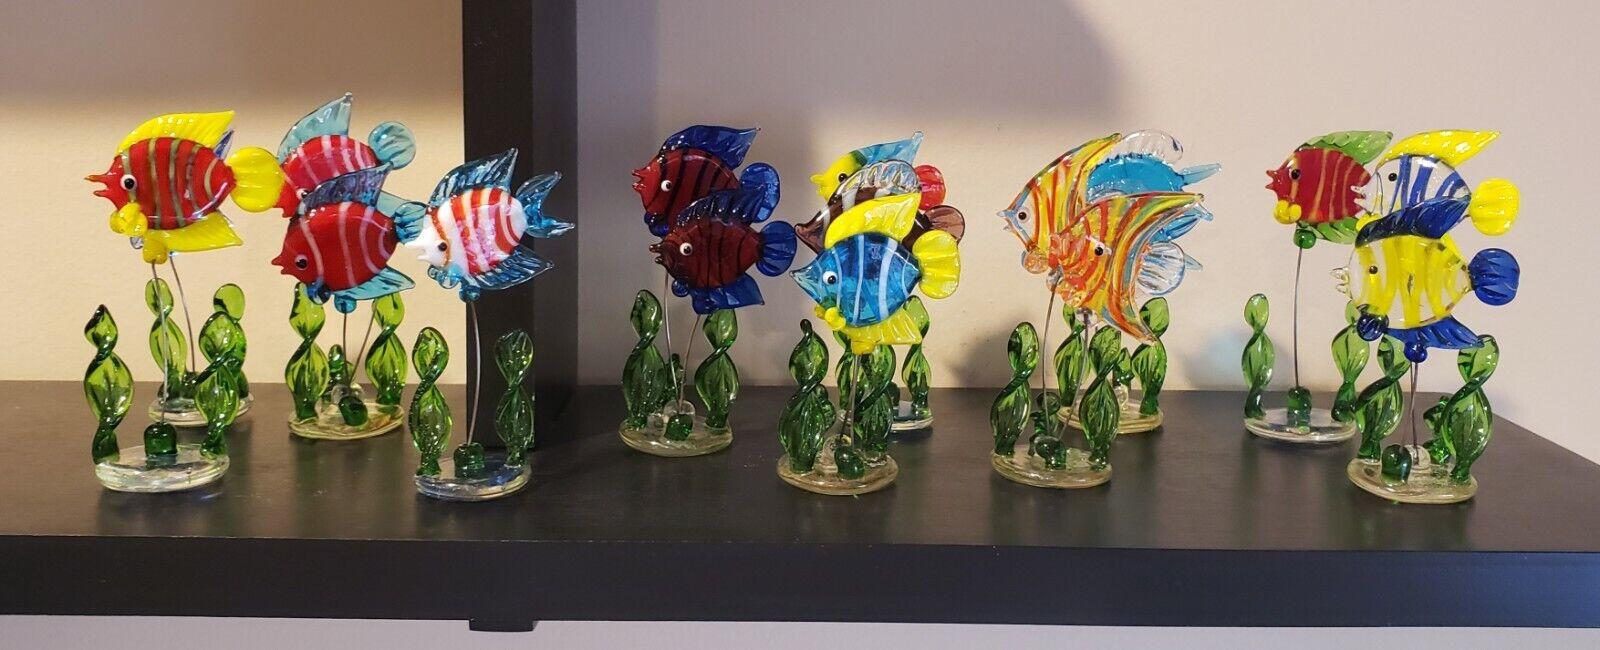 12 PIECE GLASS MINI-FISH SET / ART GLASS